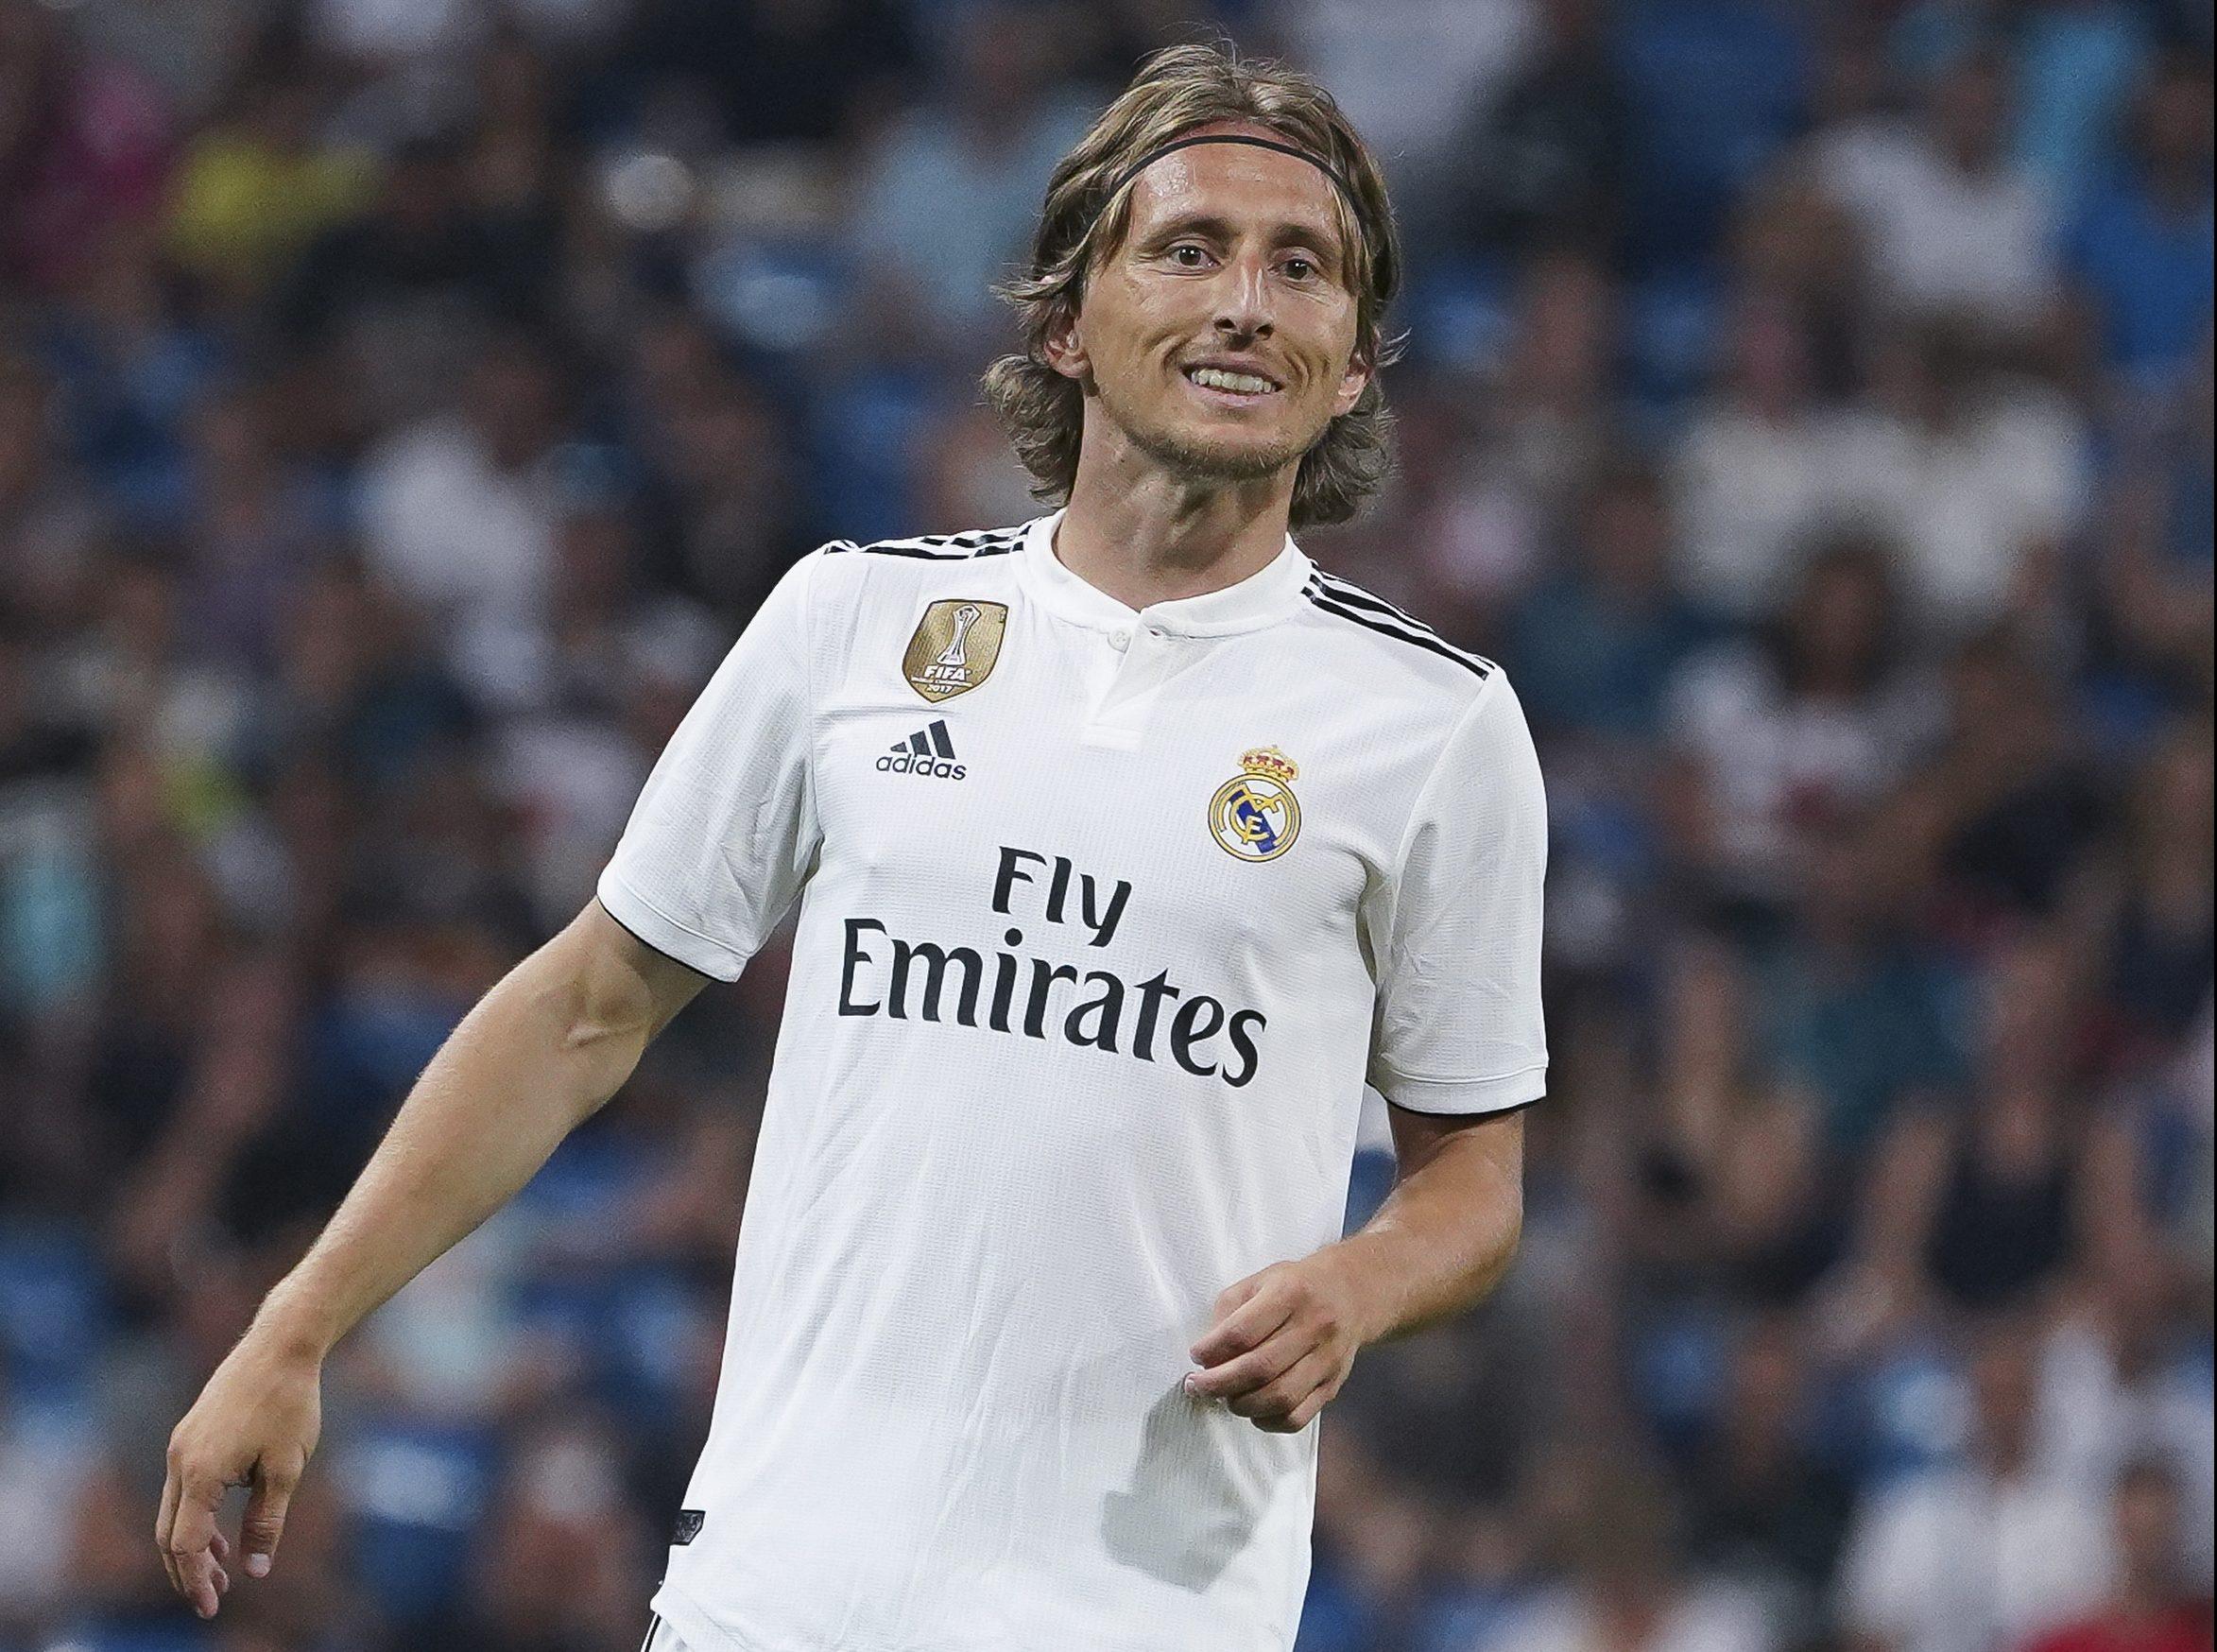 Luka Modric's agent fuels Inter Milan transfer speculation